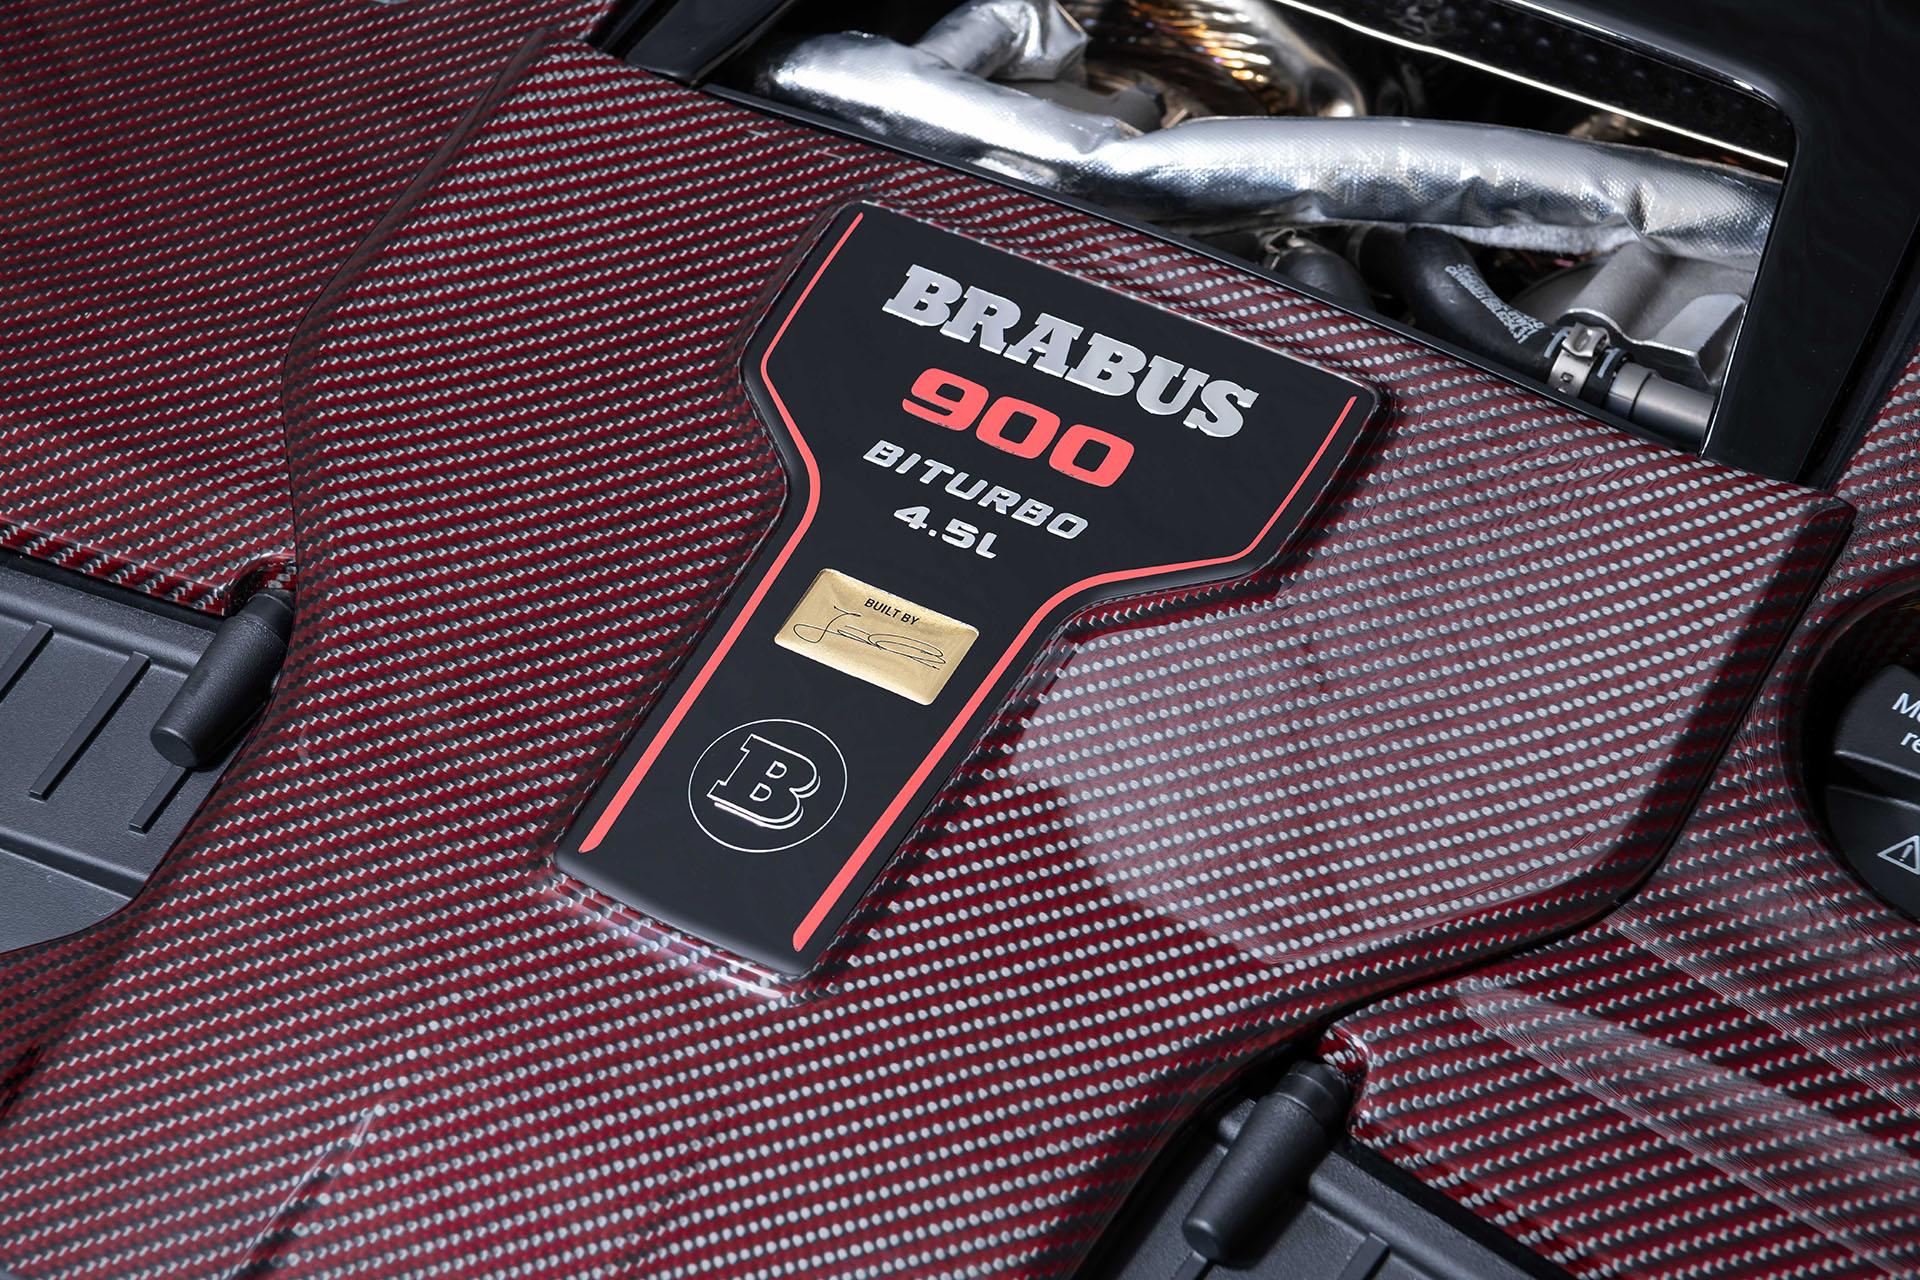 The Brabus 900 Rocket Edition